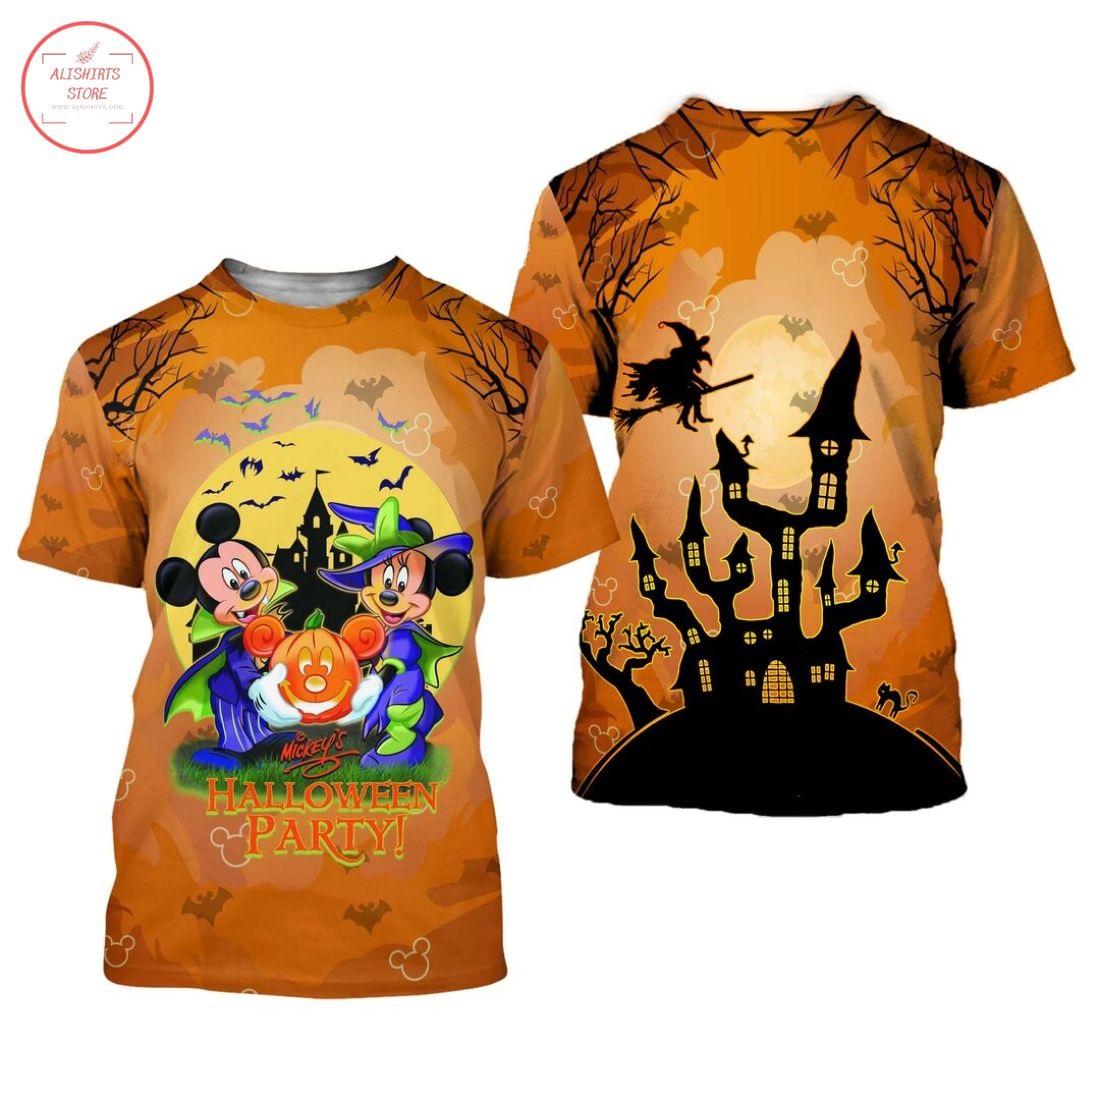 Mickey and Minnie Happy Halloween Shirt